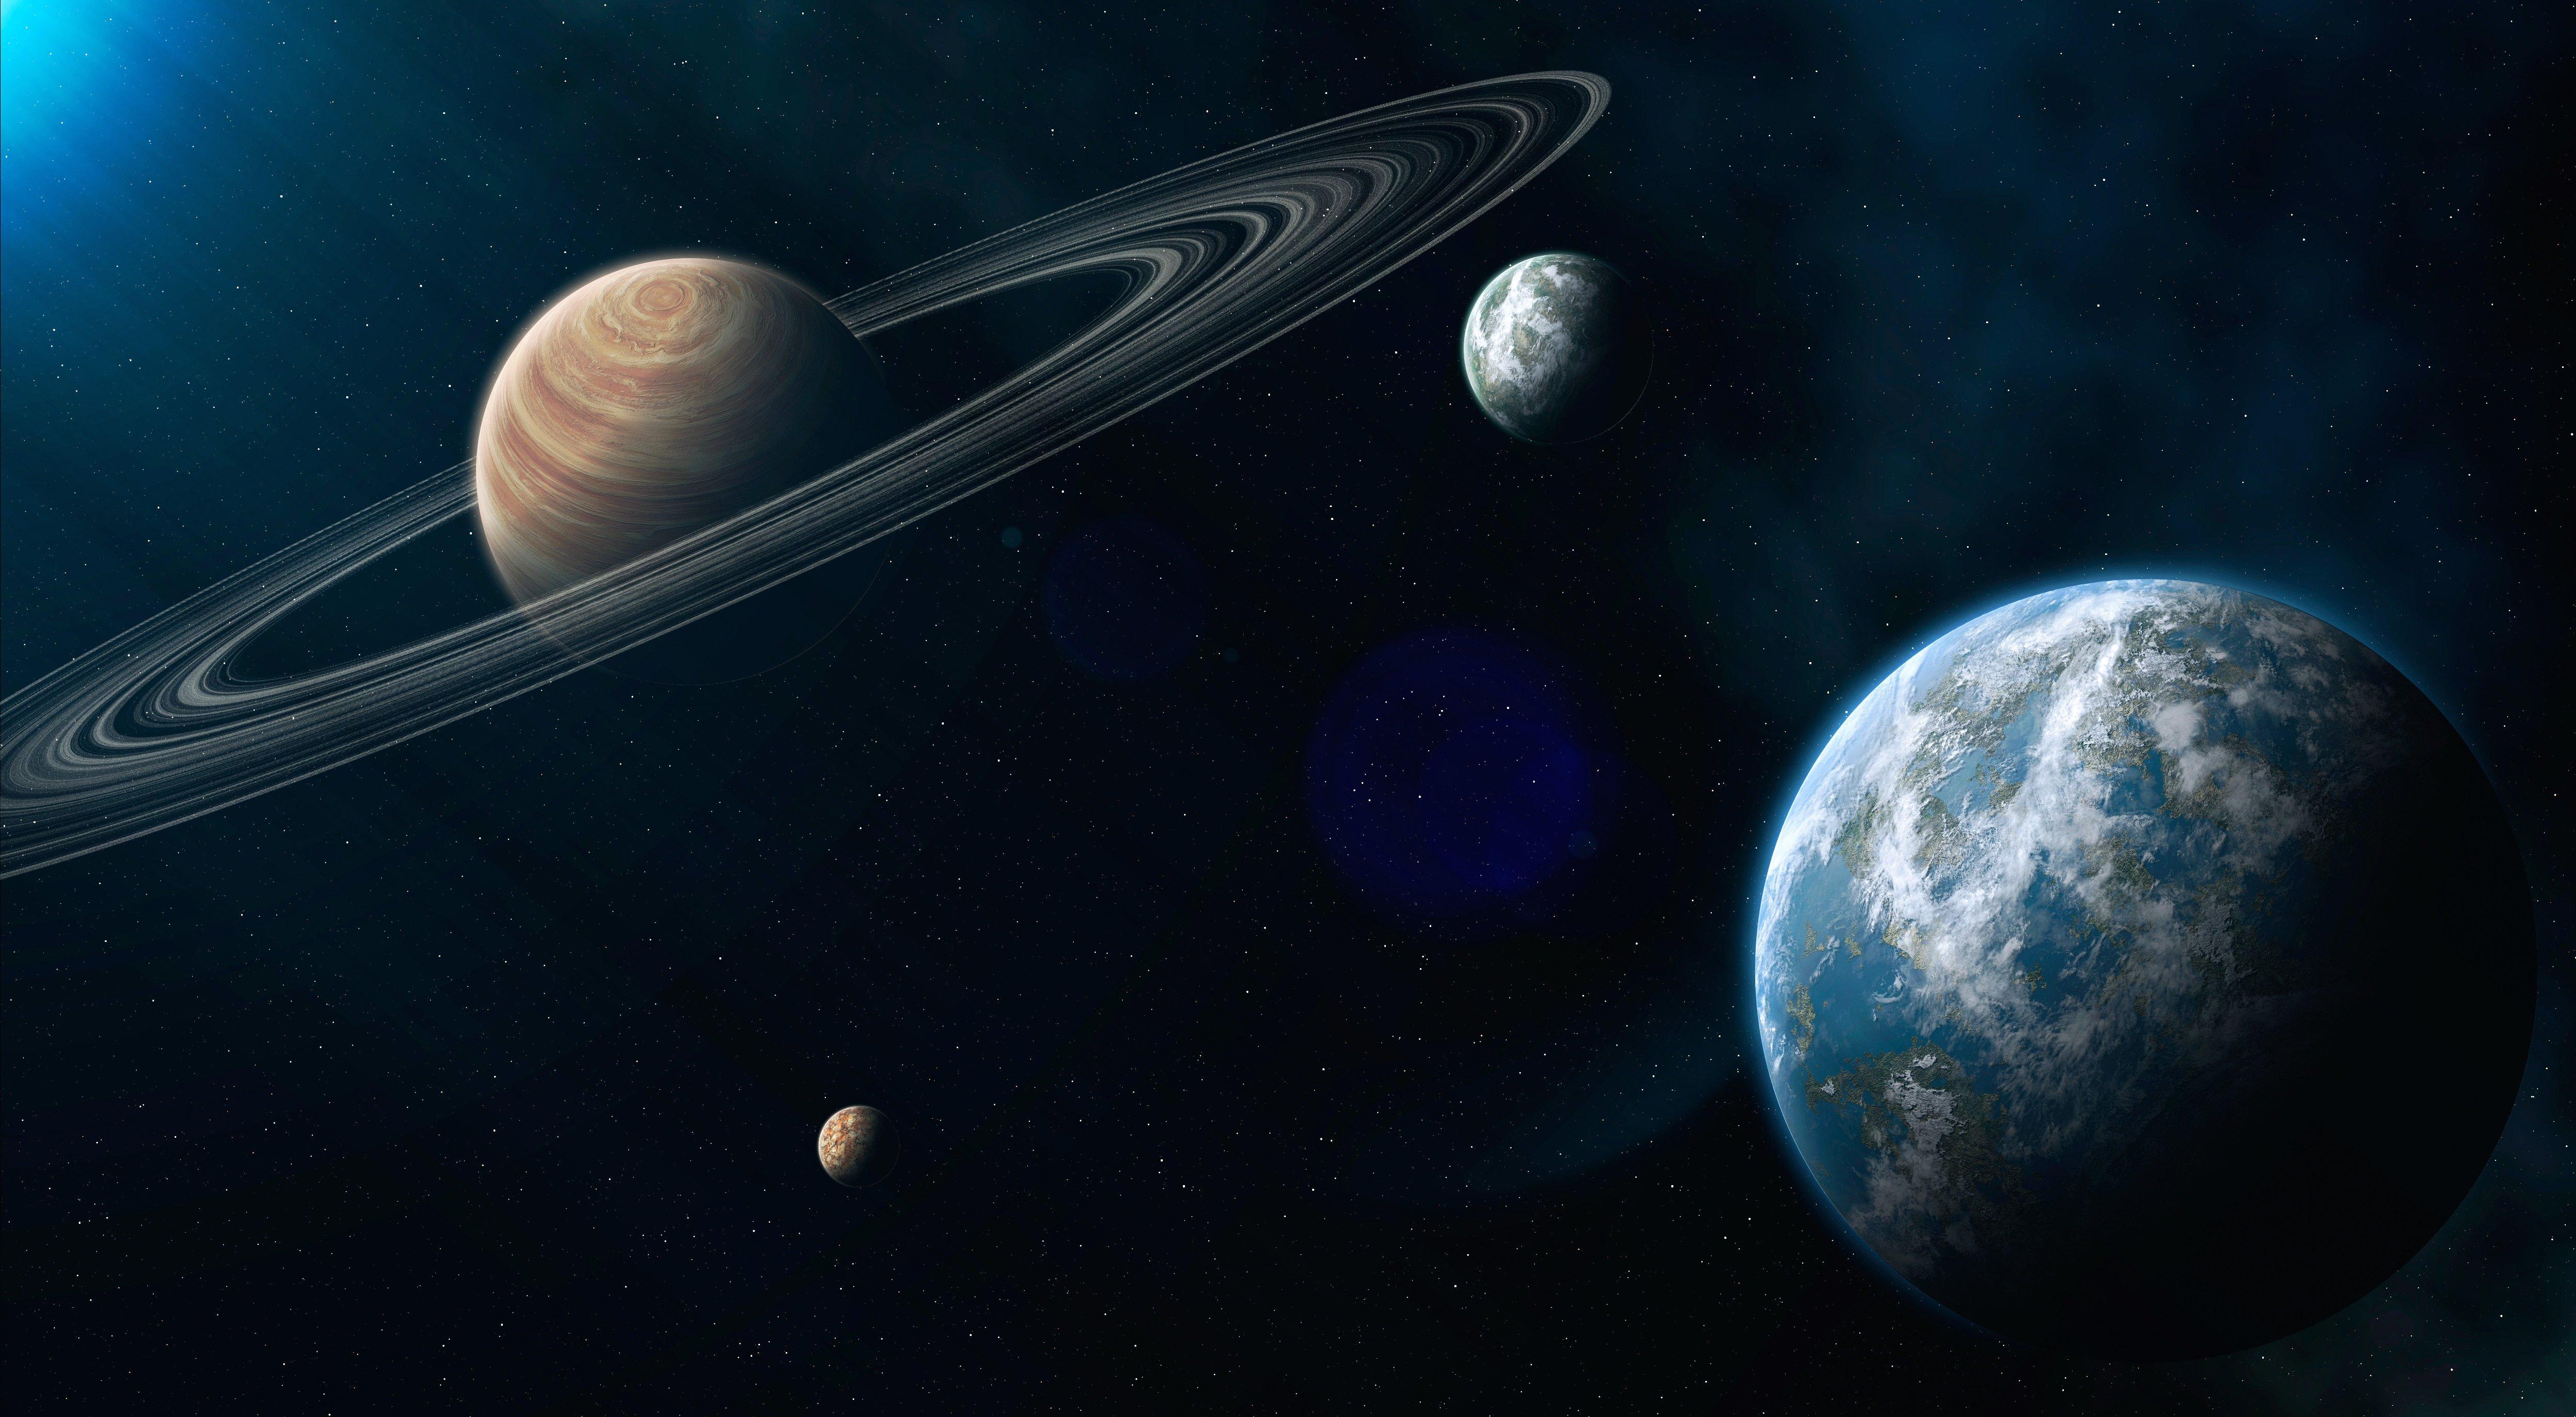 Planet Space earth moon sci-fi stars wallpaper | 5000x2750 ...